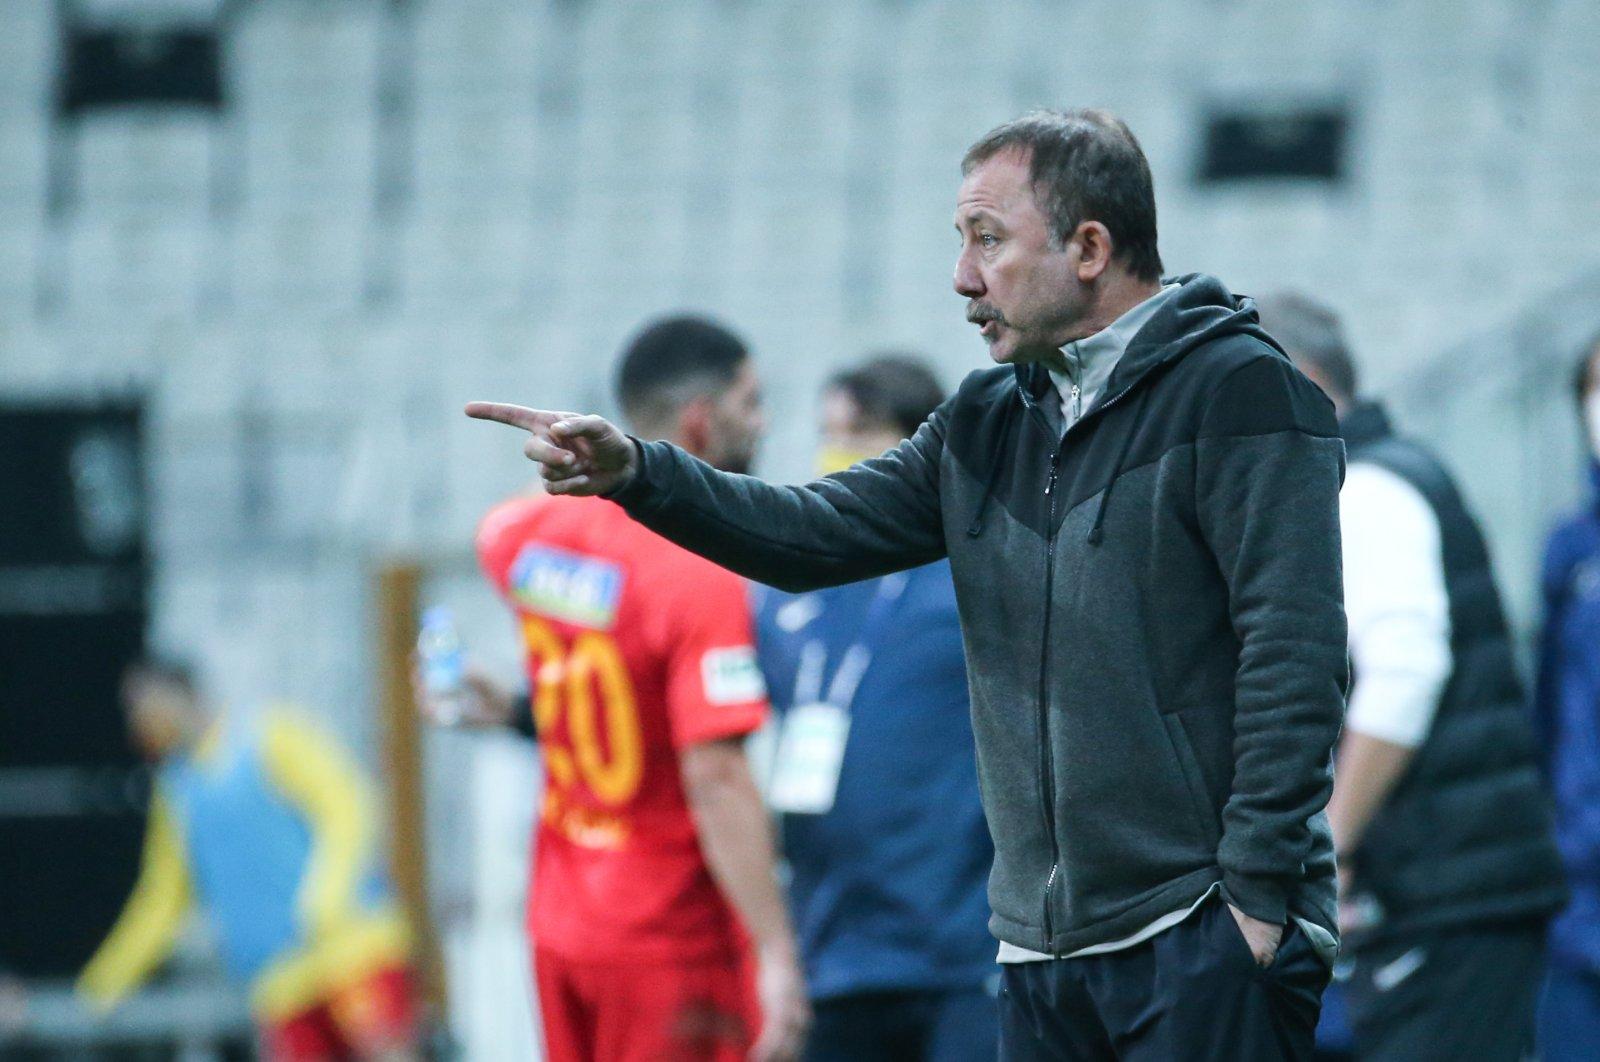 Beşiktaş coach Sergen Yalçın reacts during a Süper Lig match against Malatyaspor, in Istanbul, Turkey, Nov. 1, 2020. (AA Photo)